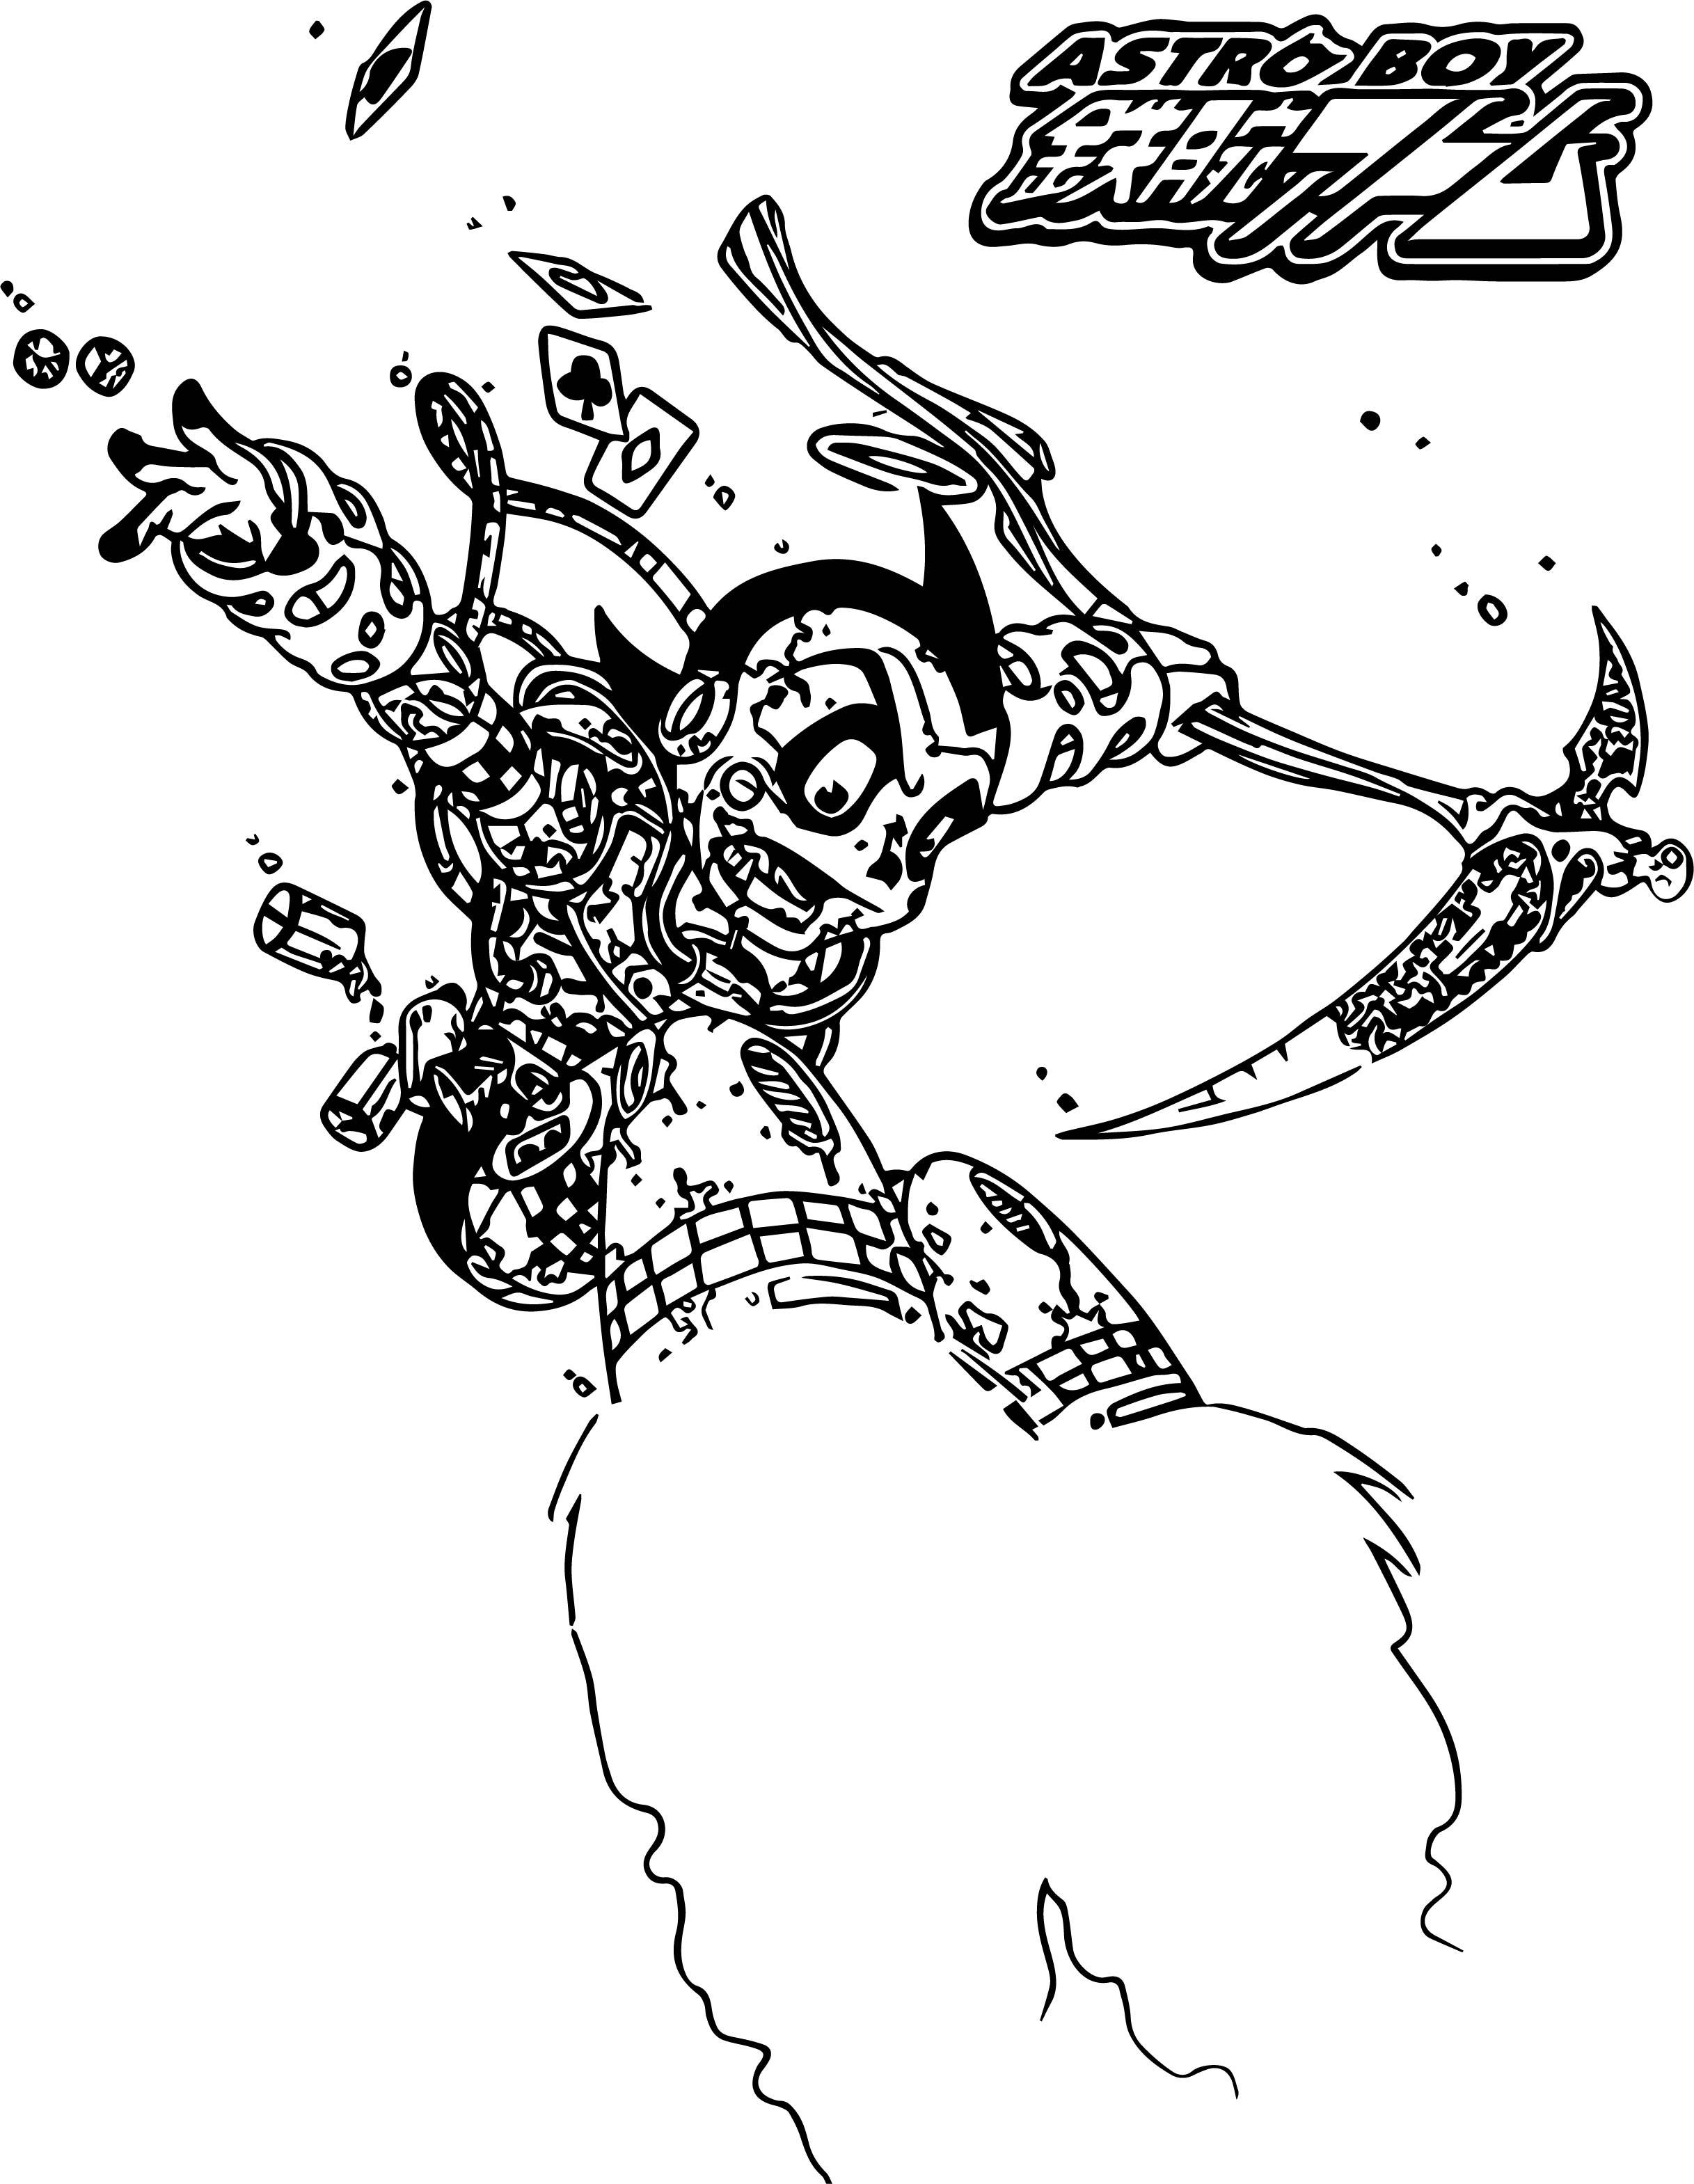 Astroboy Crazy Robot Coloring Page